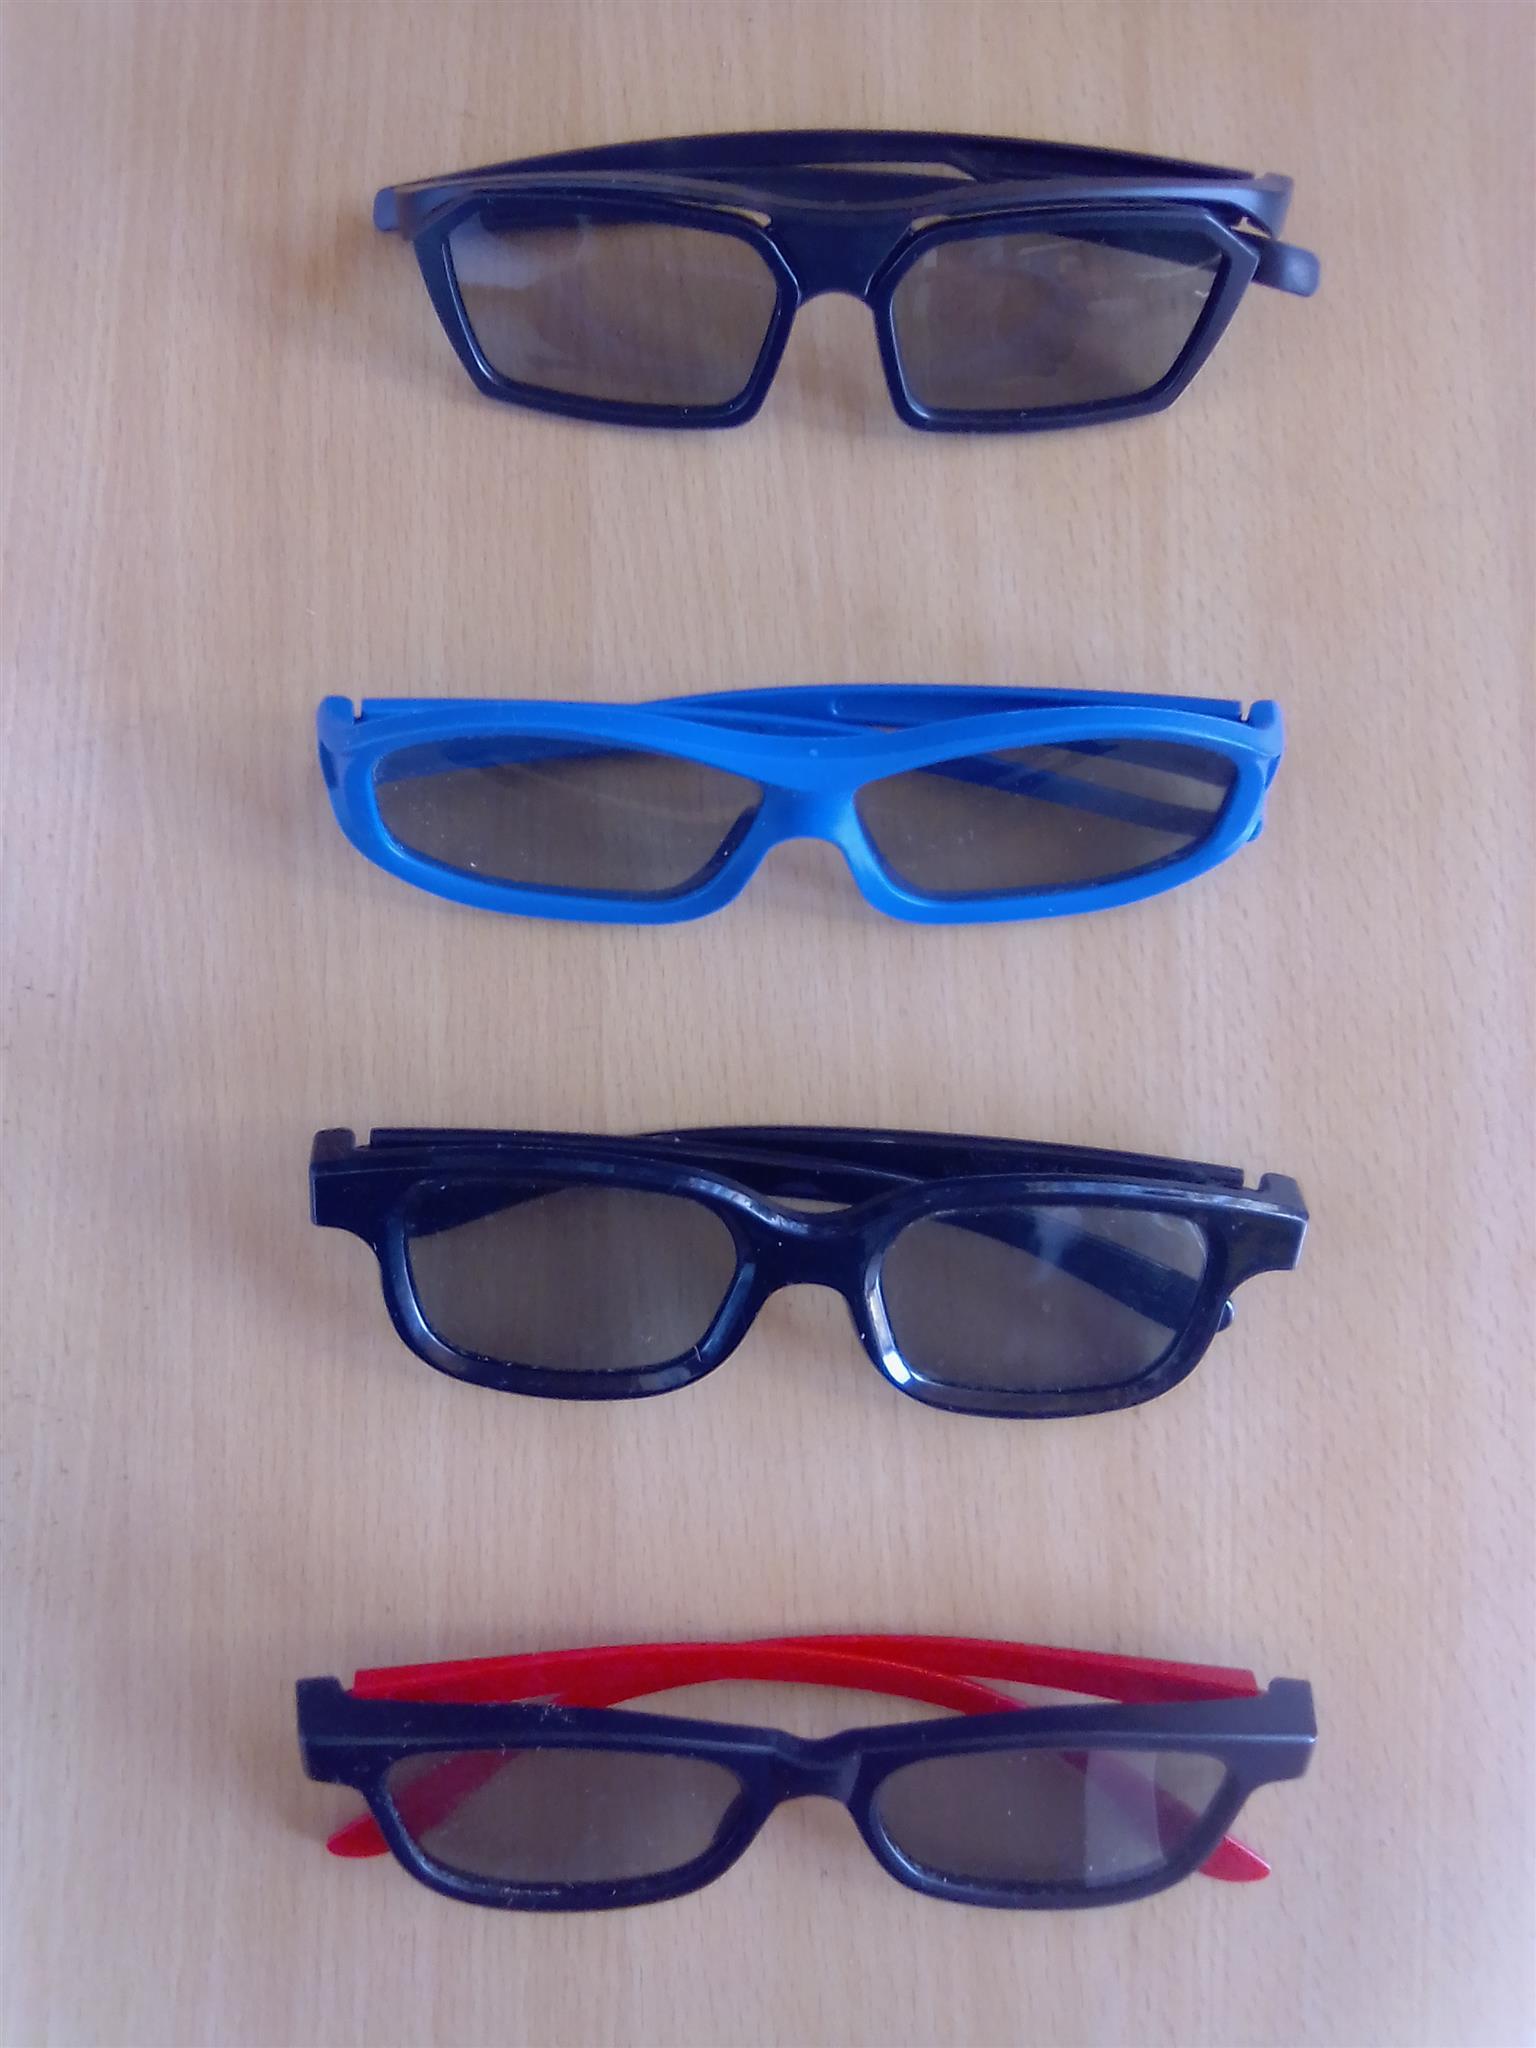 3D Glasses for 3D TV..